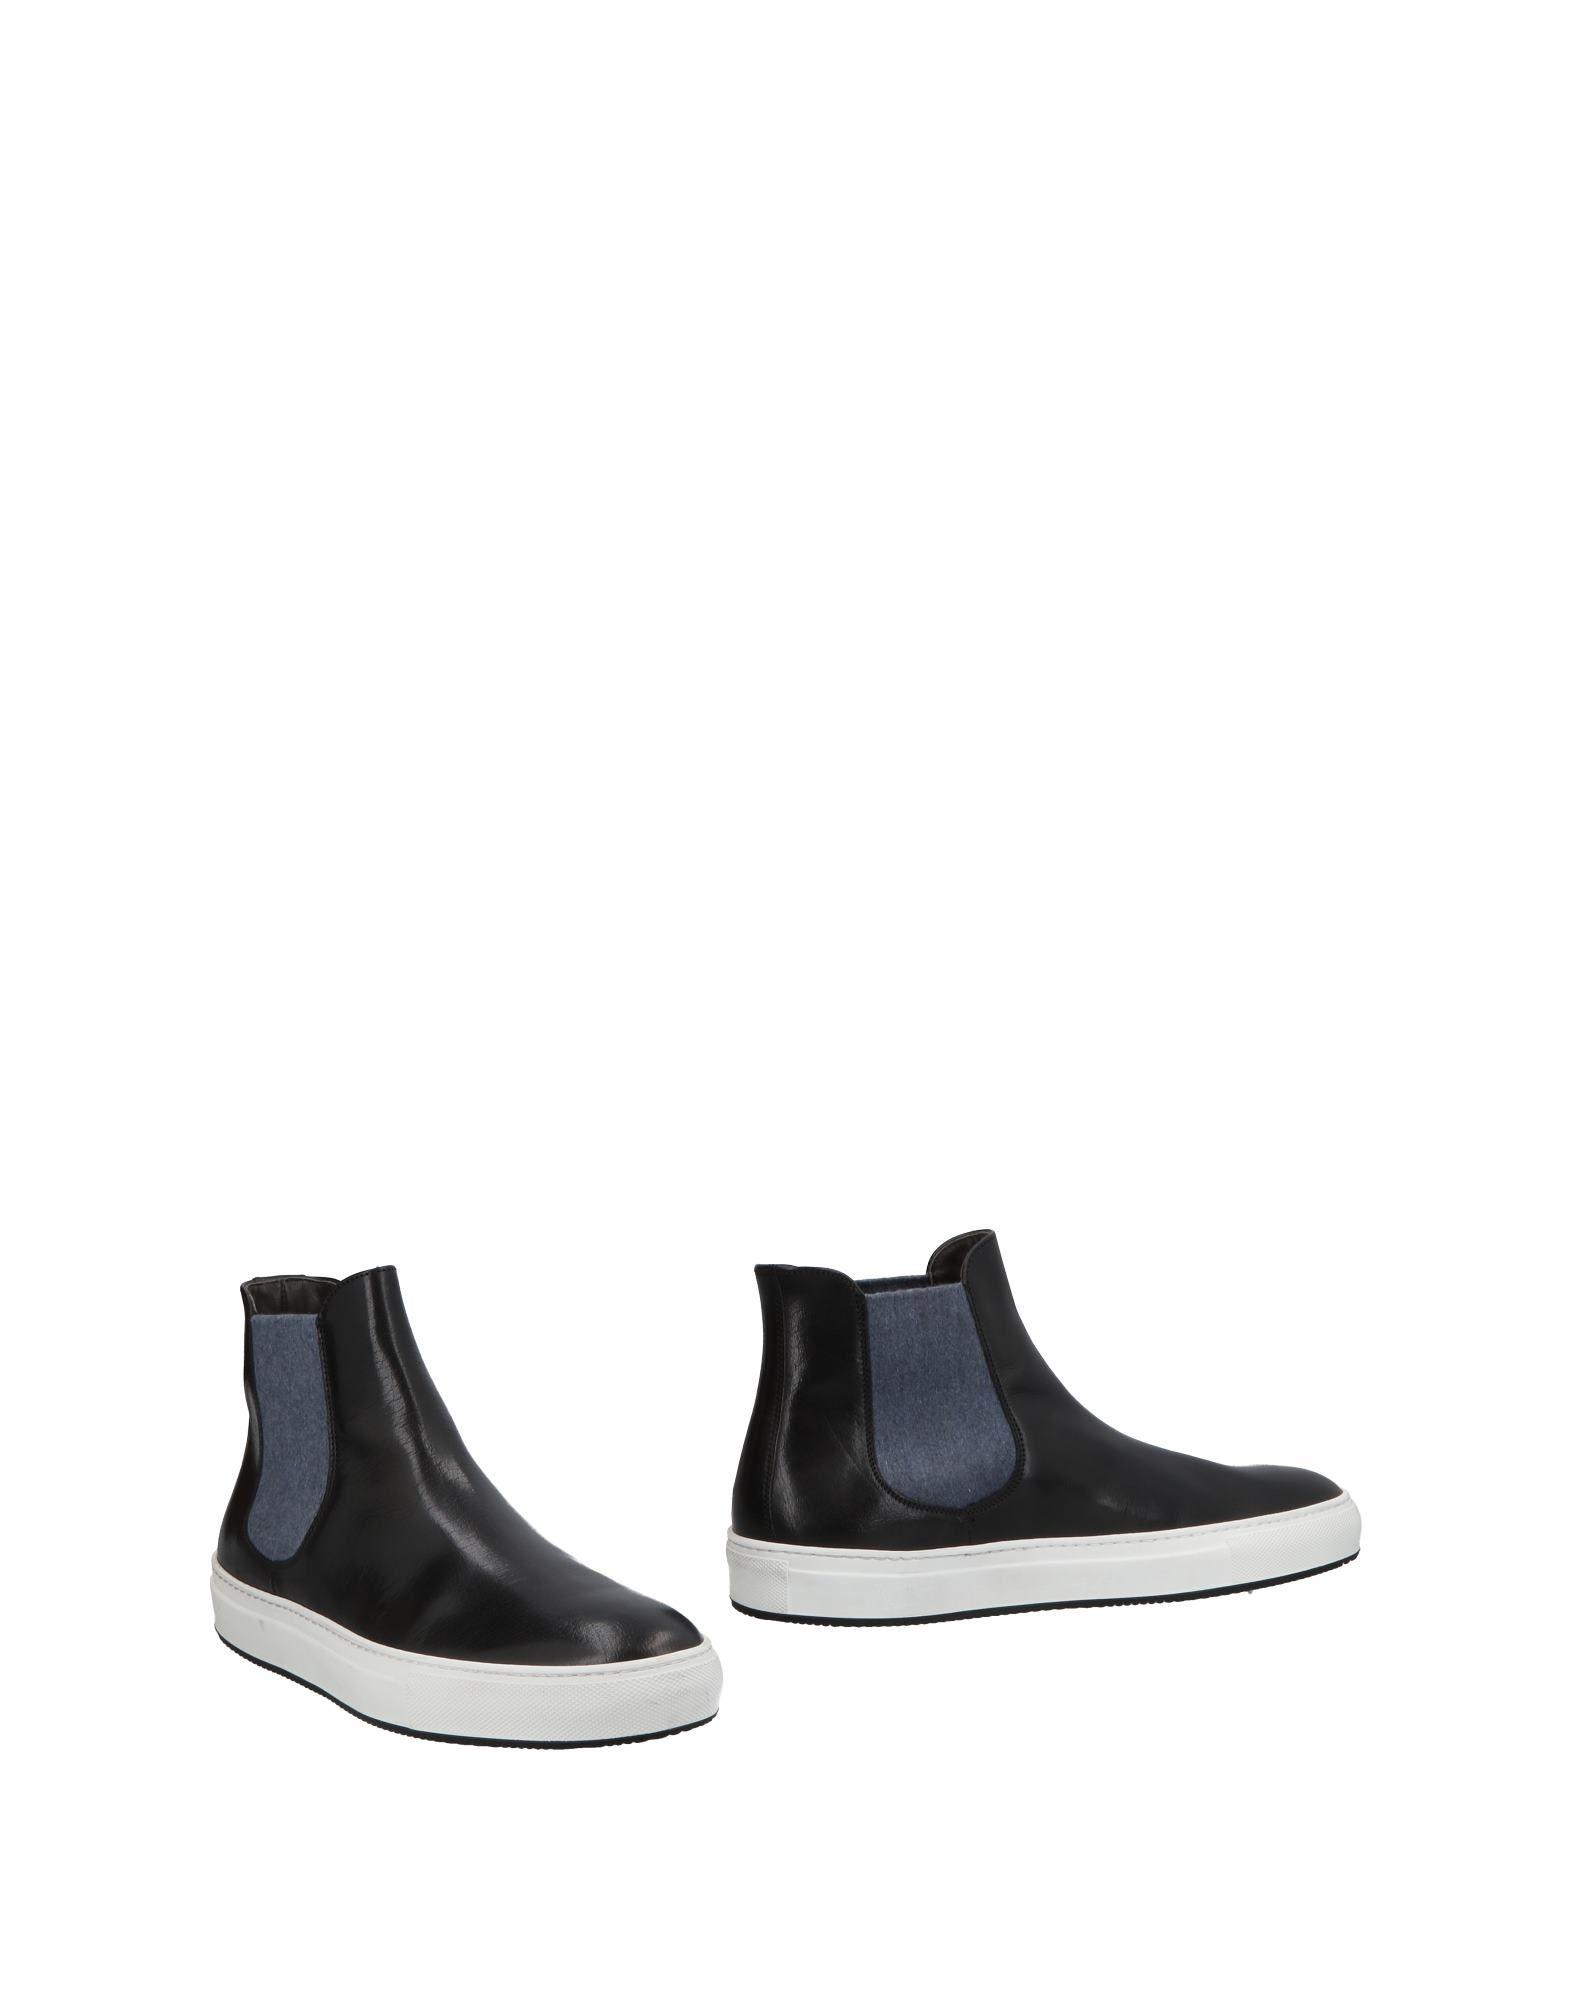 CORVARI Boots in Black